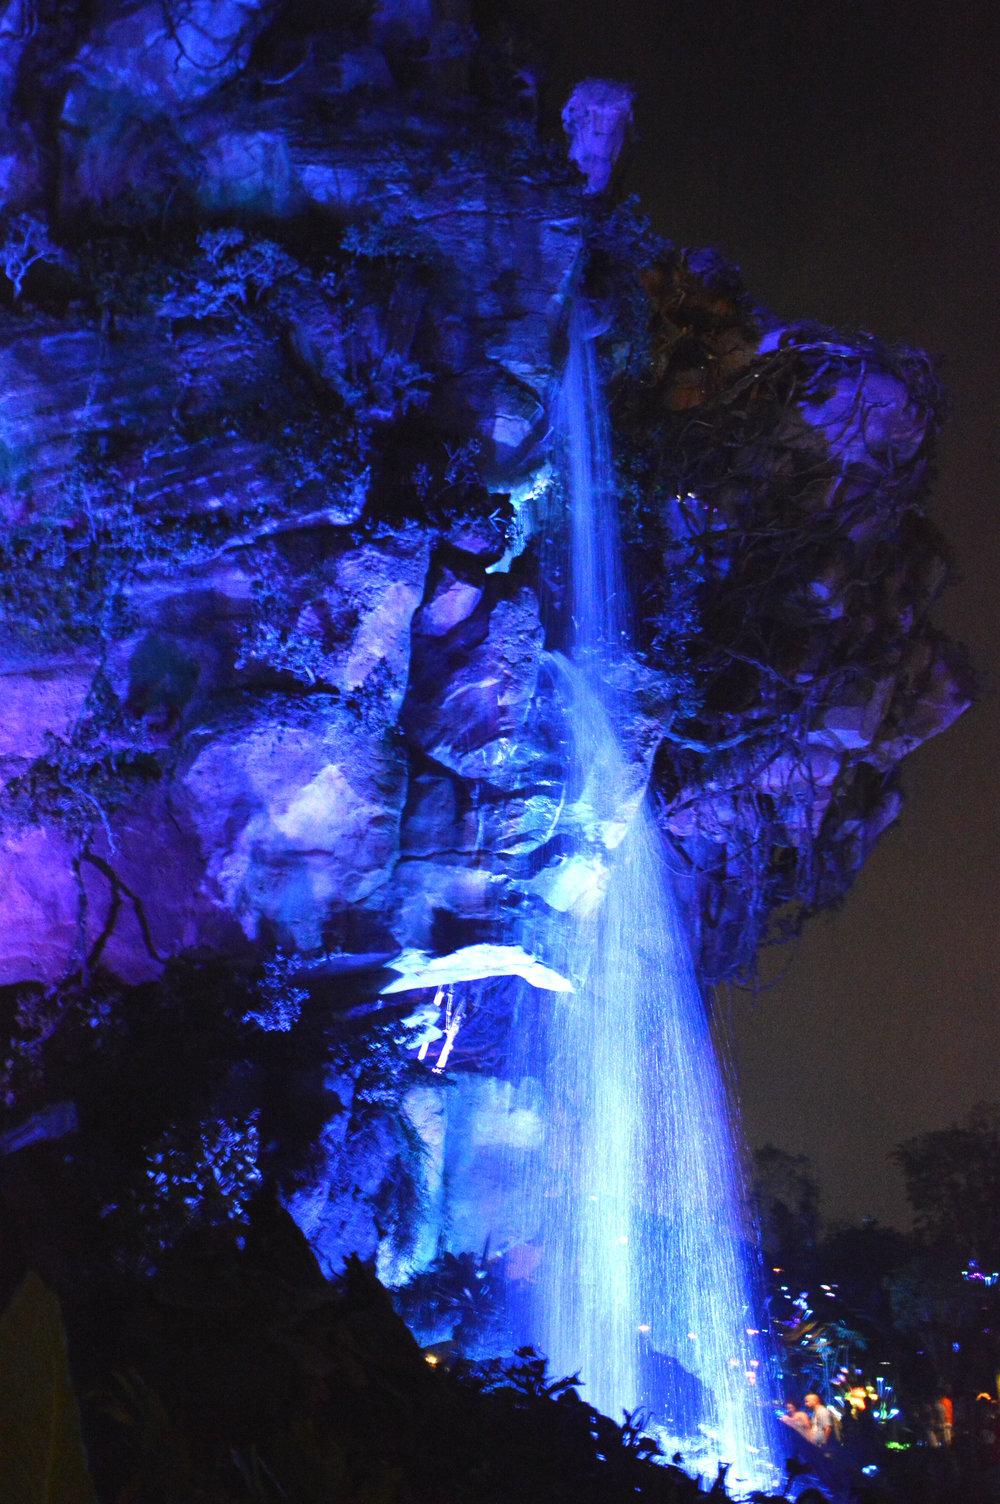 pandoranightwaterfall.jpg